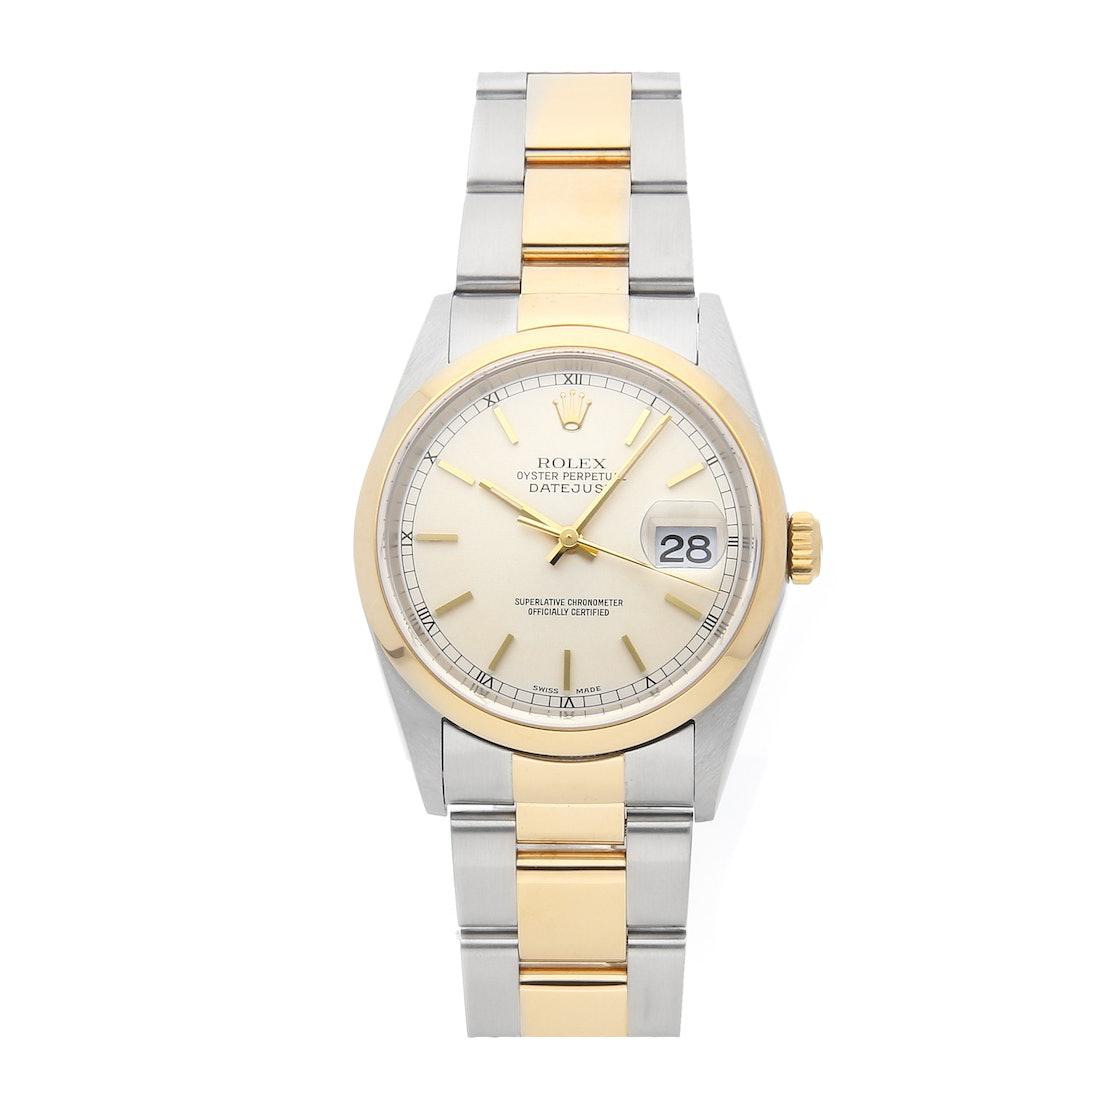 Rolex Datejust 16203